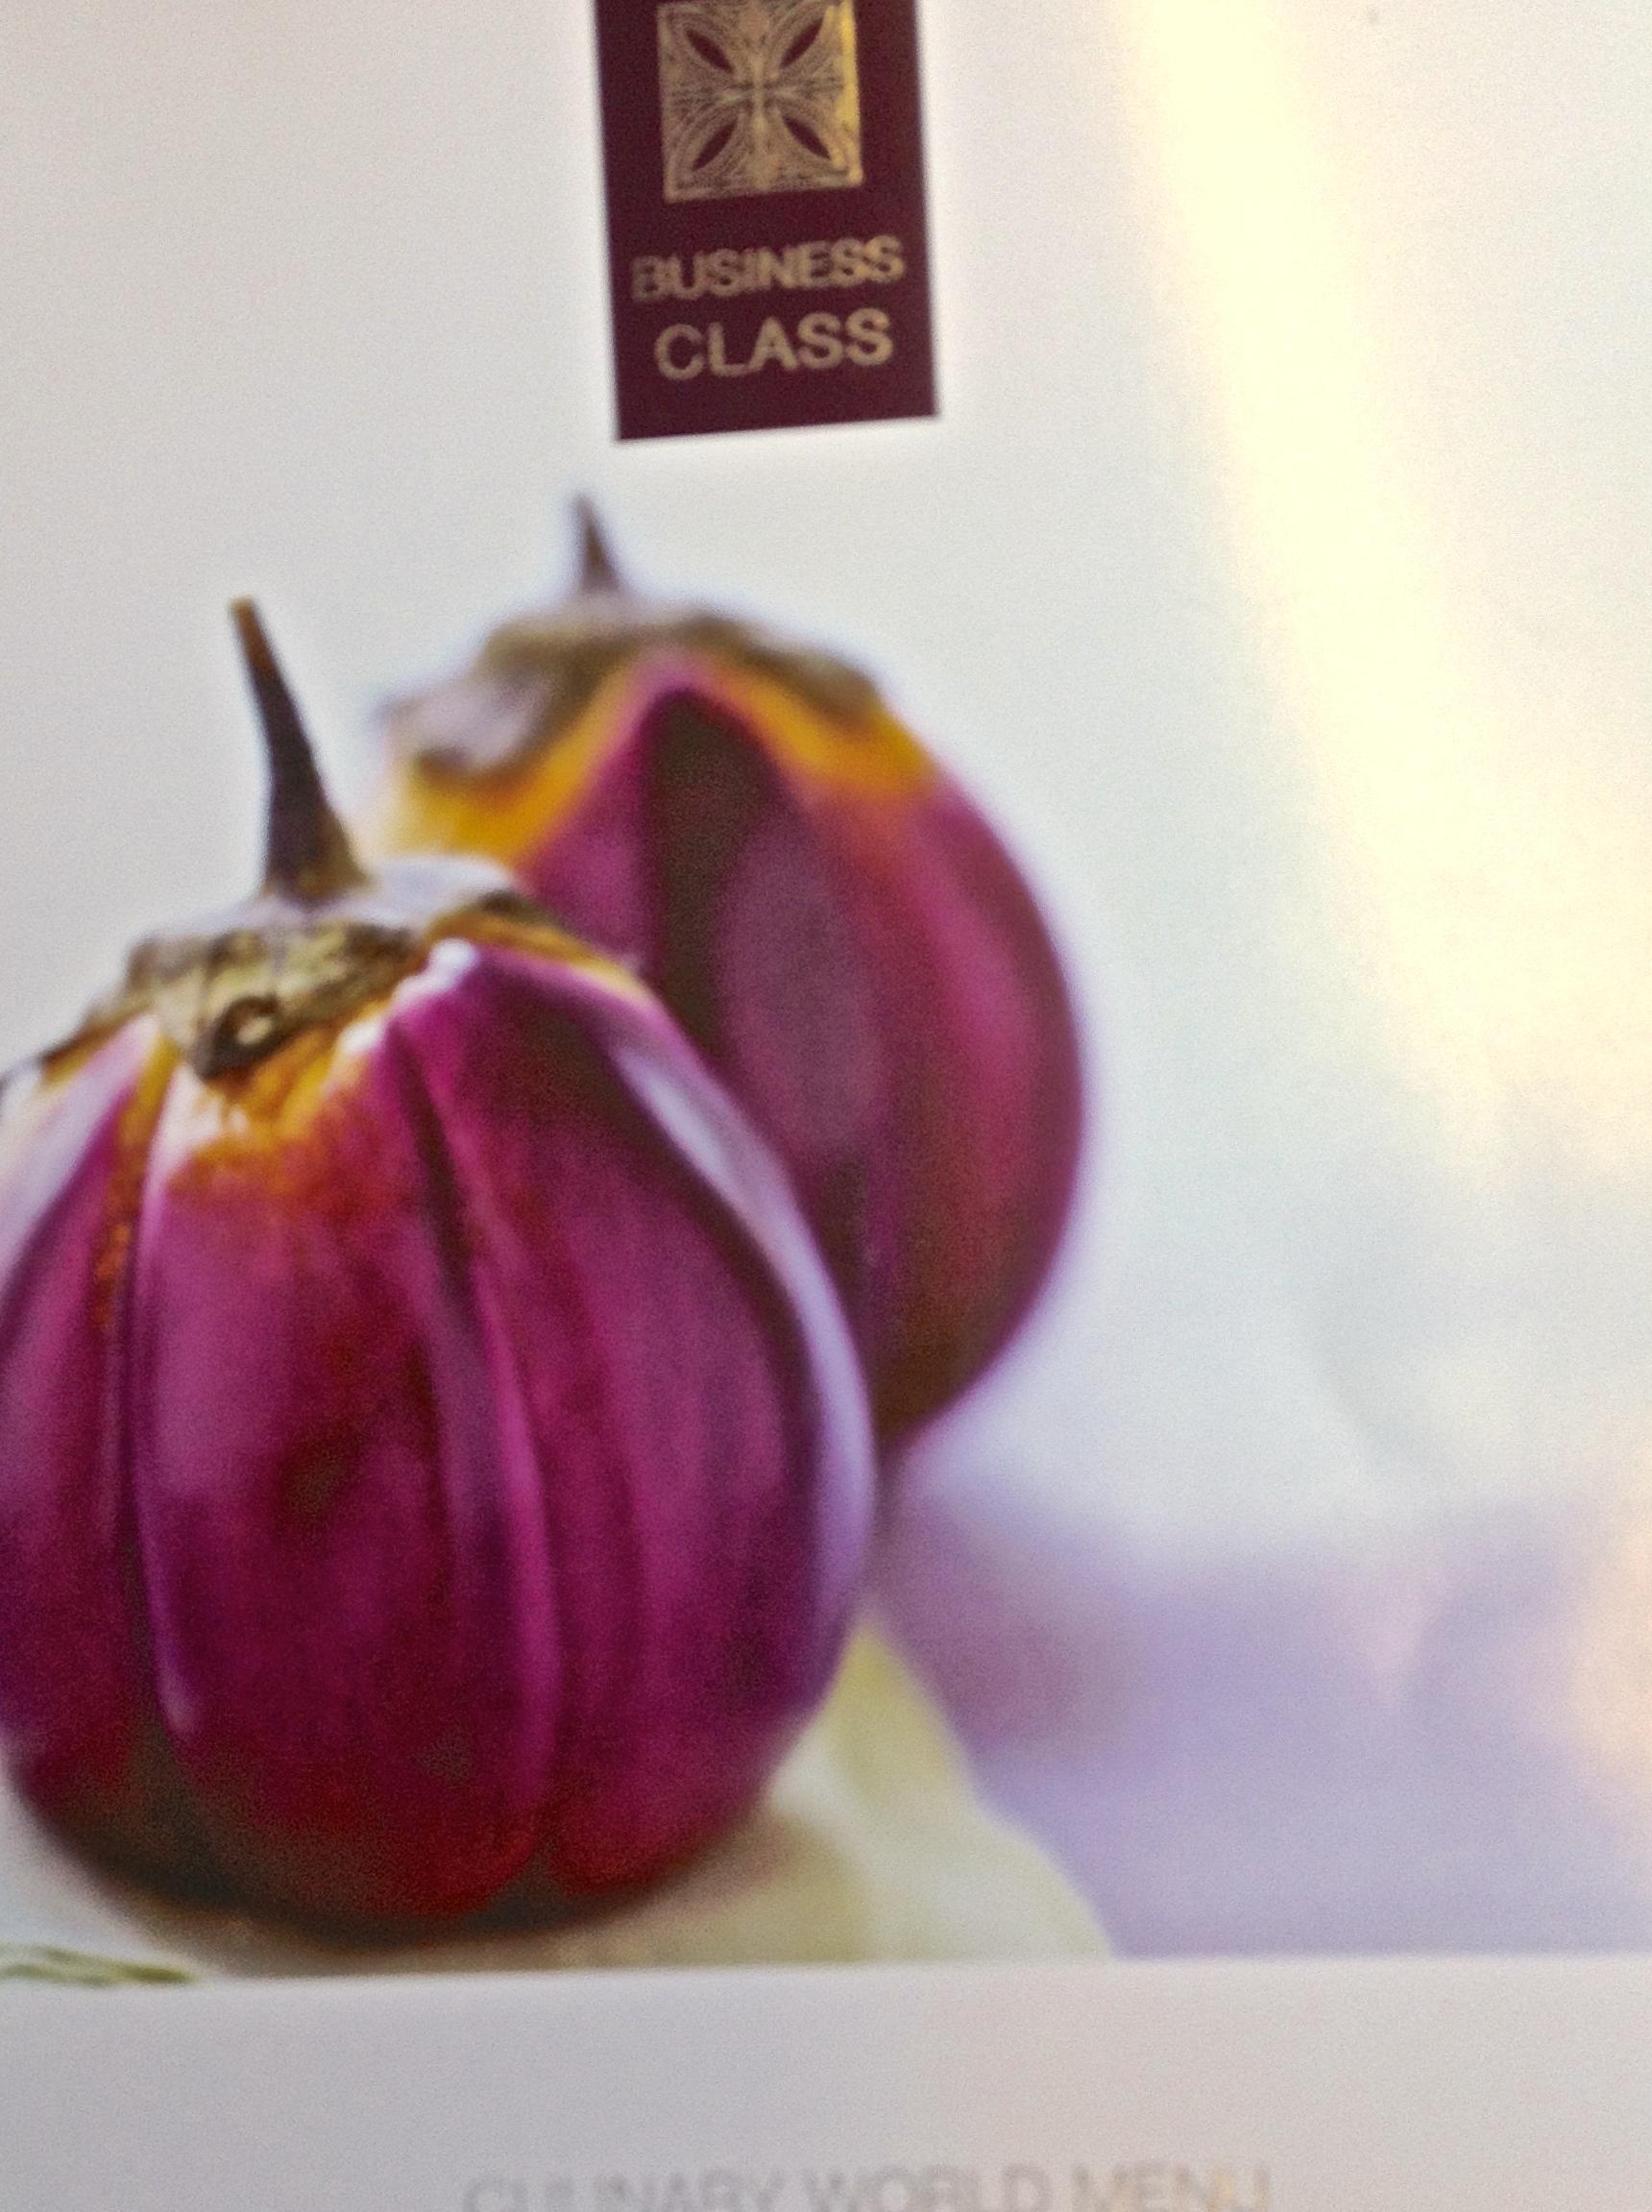 Business Class menu on Qatar Airways